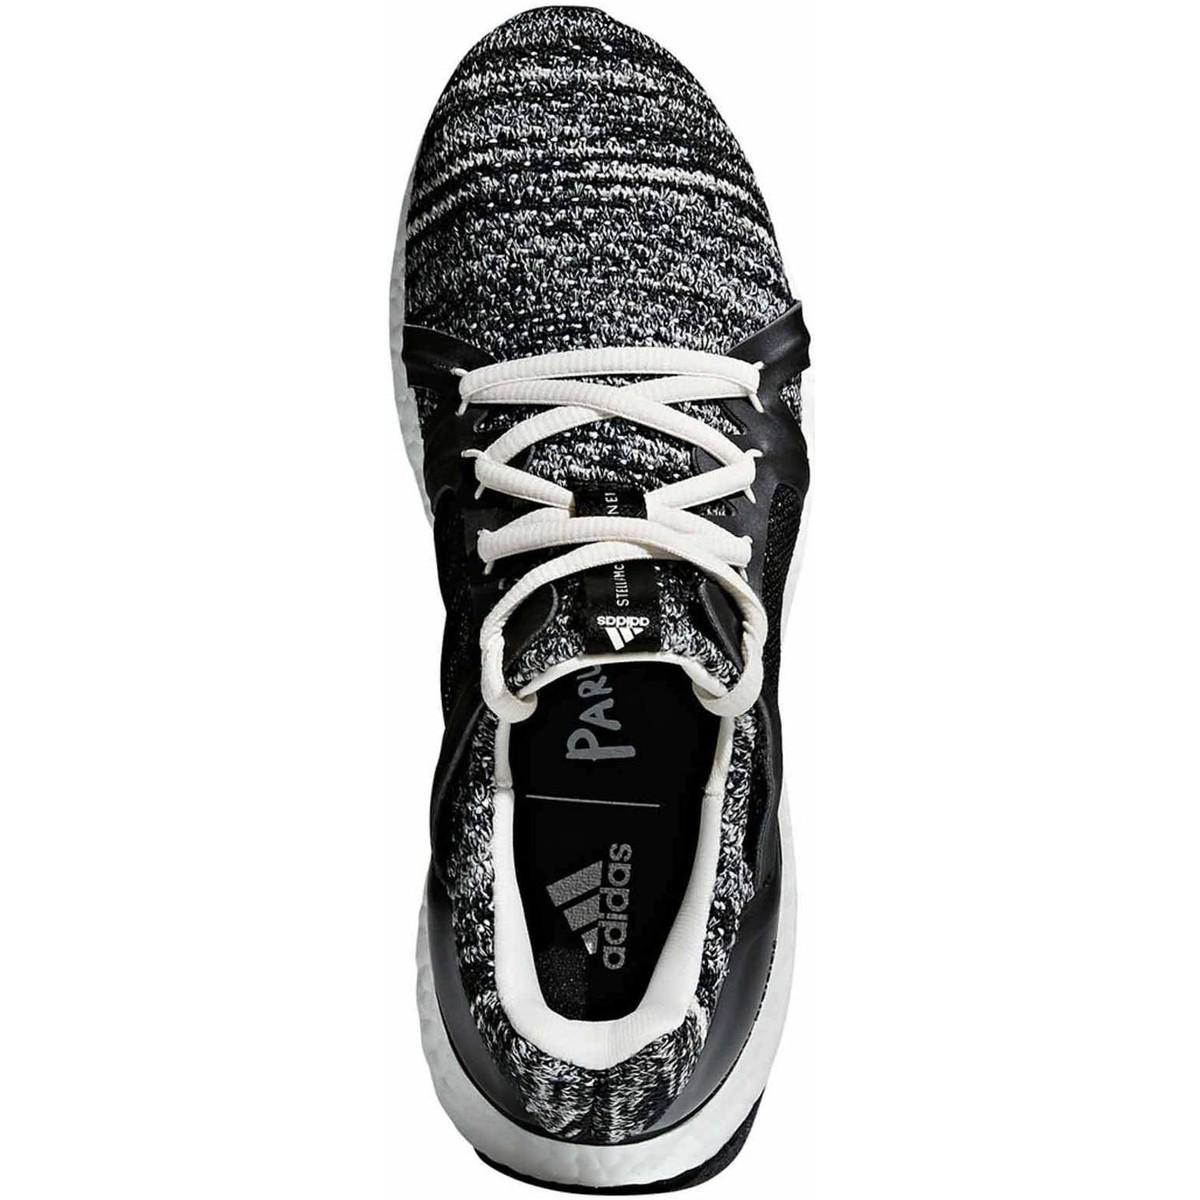 d976313155c Adidas Ultra Boost Parley - Black - 4 Black Women s Running Trainers ...